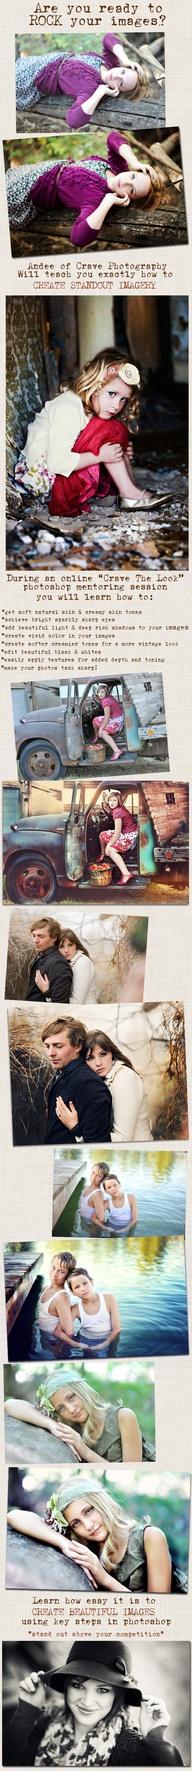 online photoshop tips